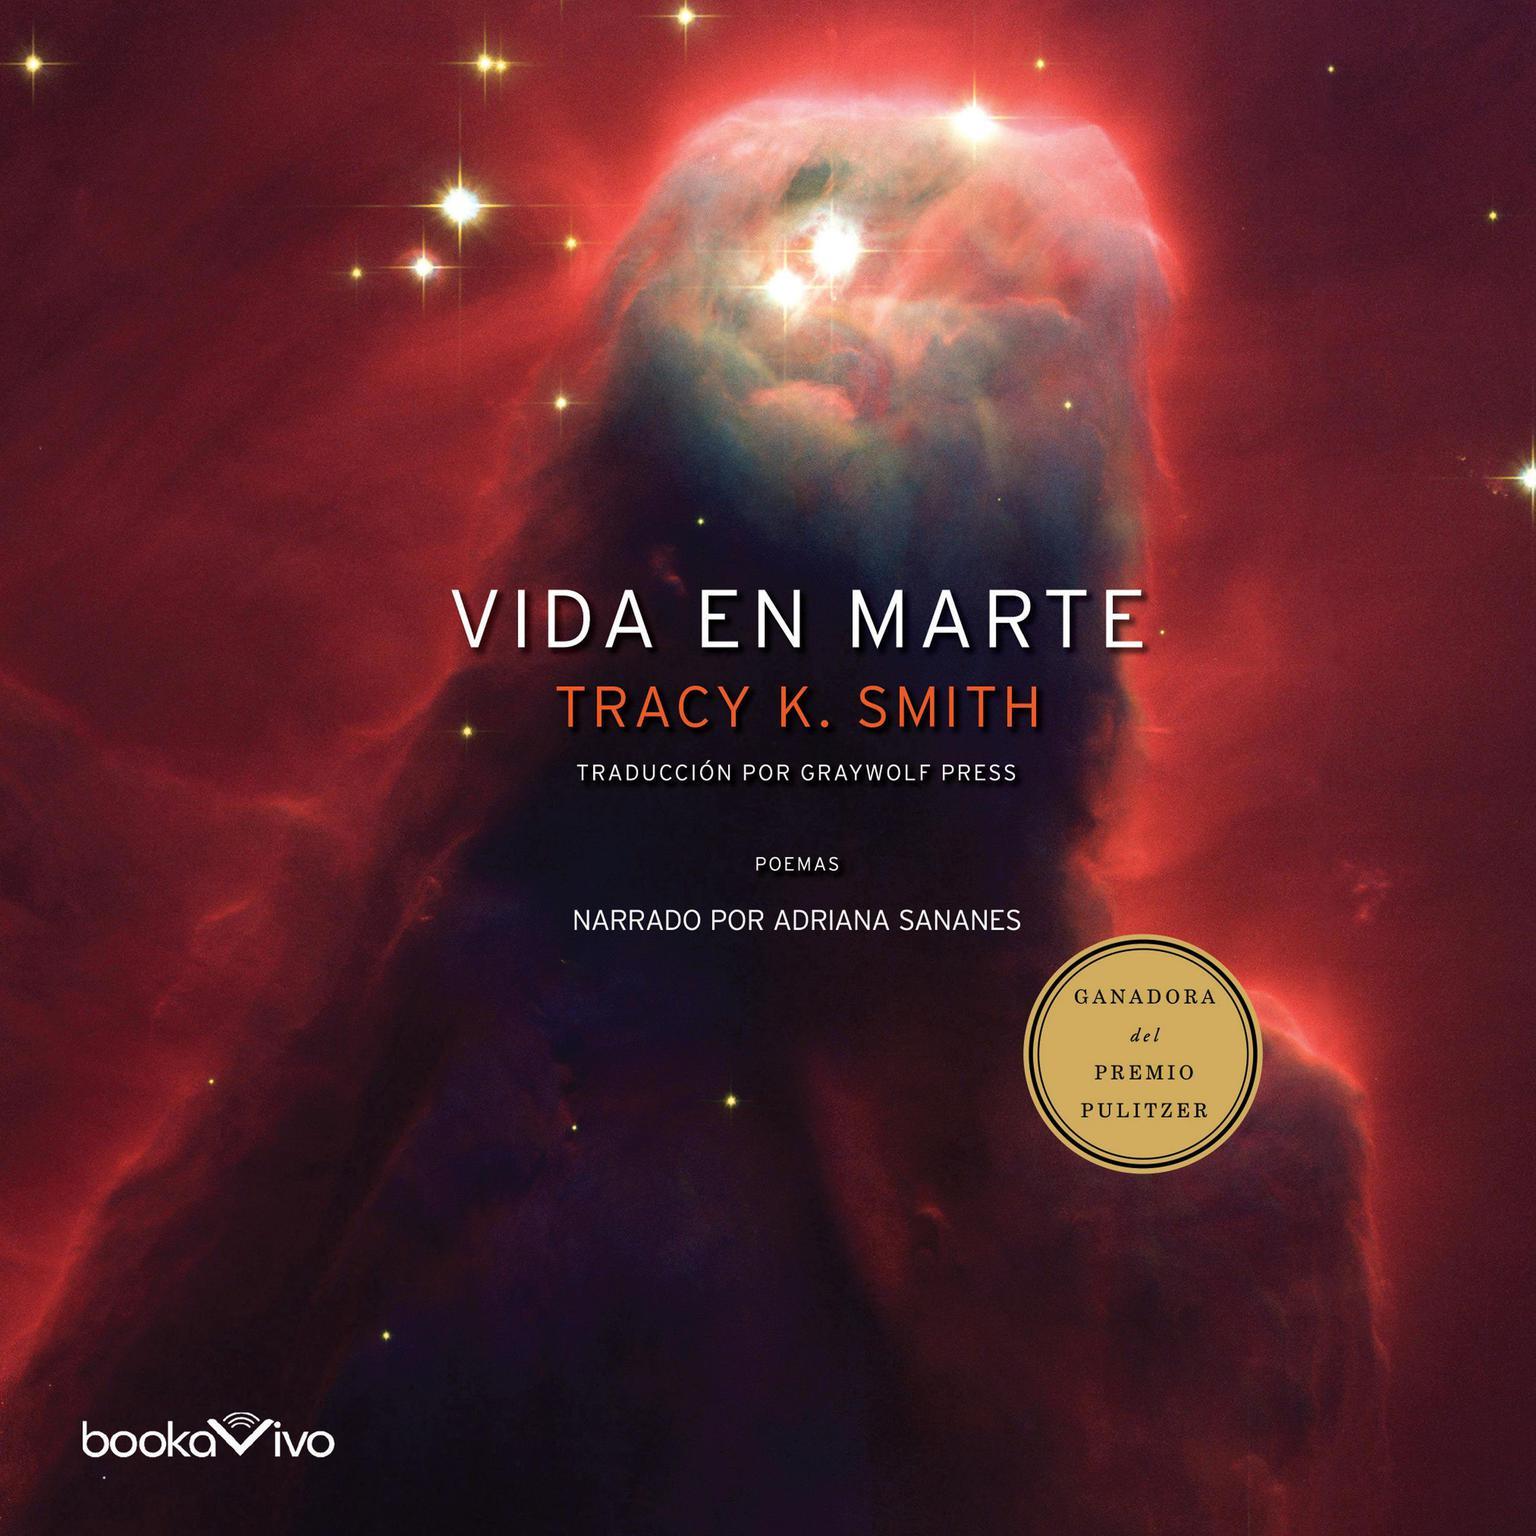 Vida en Marte (Life on Mars) Audiobook, by Tracy K. Smith